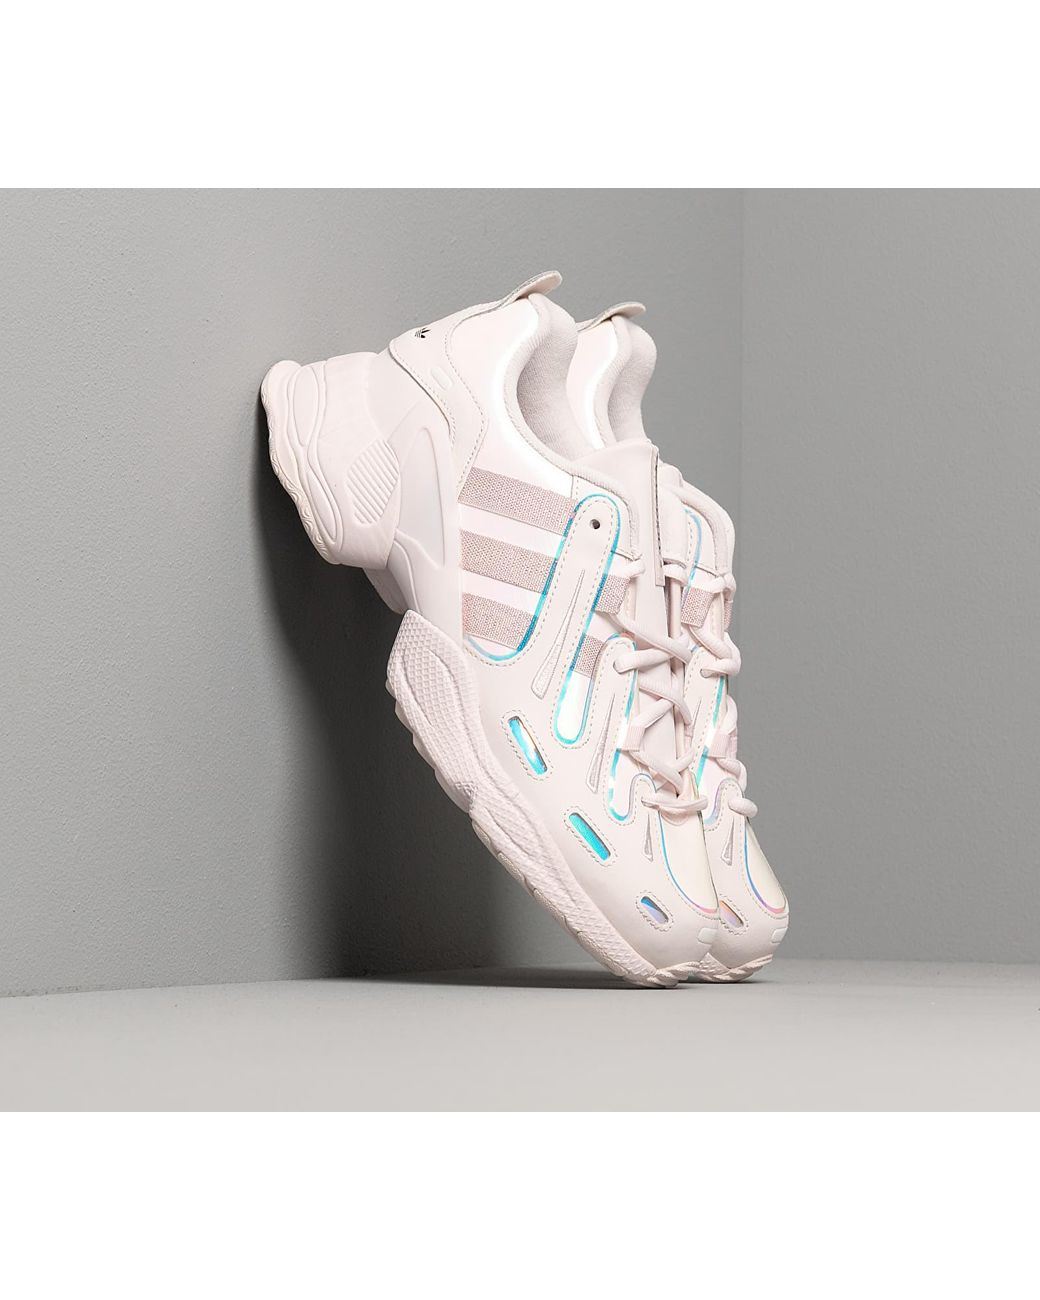 Adidas Gazelle W Orchid Tint, White & Gum | END.